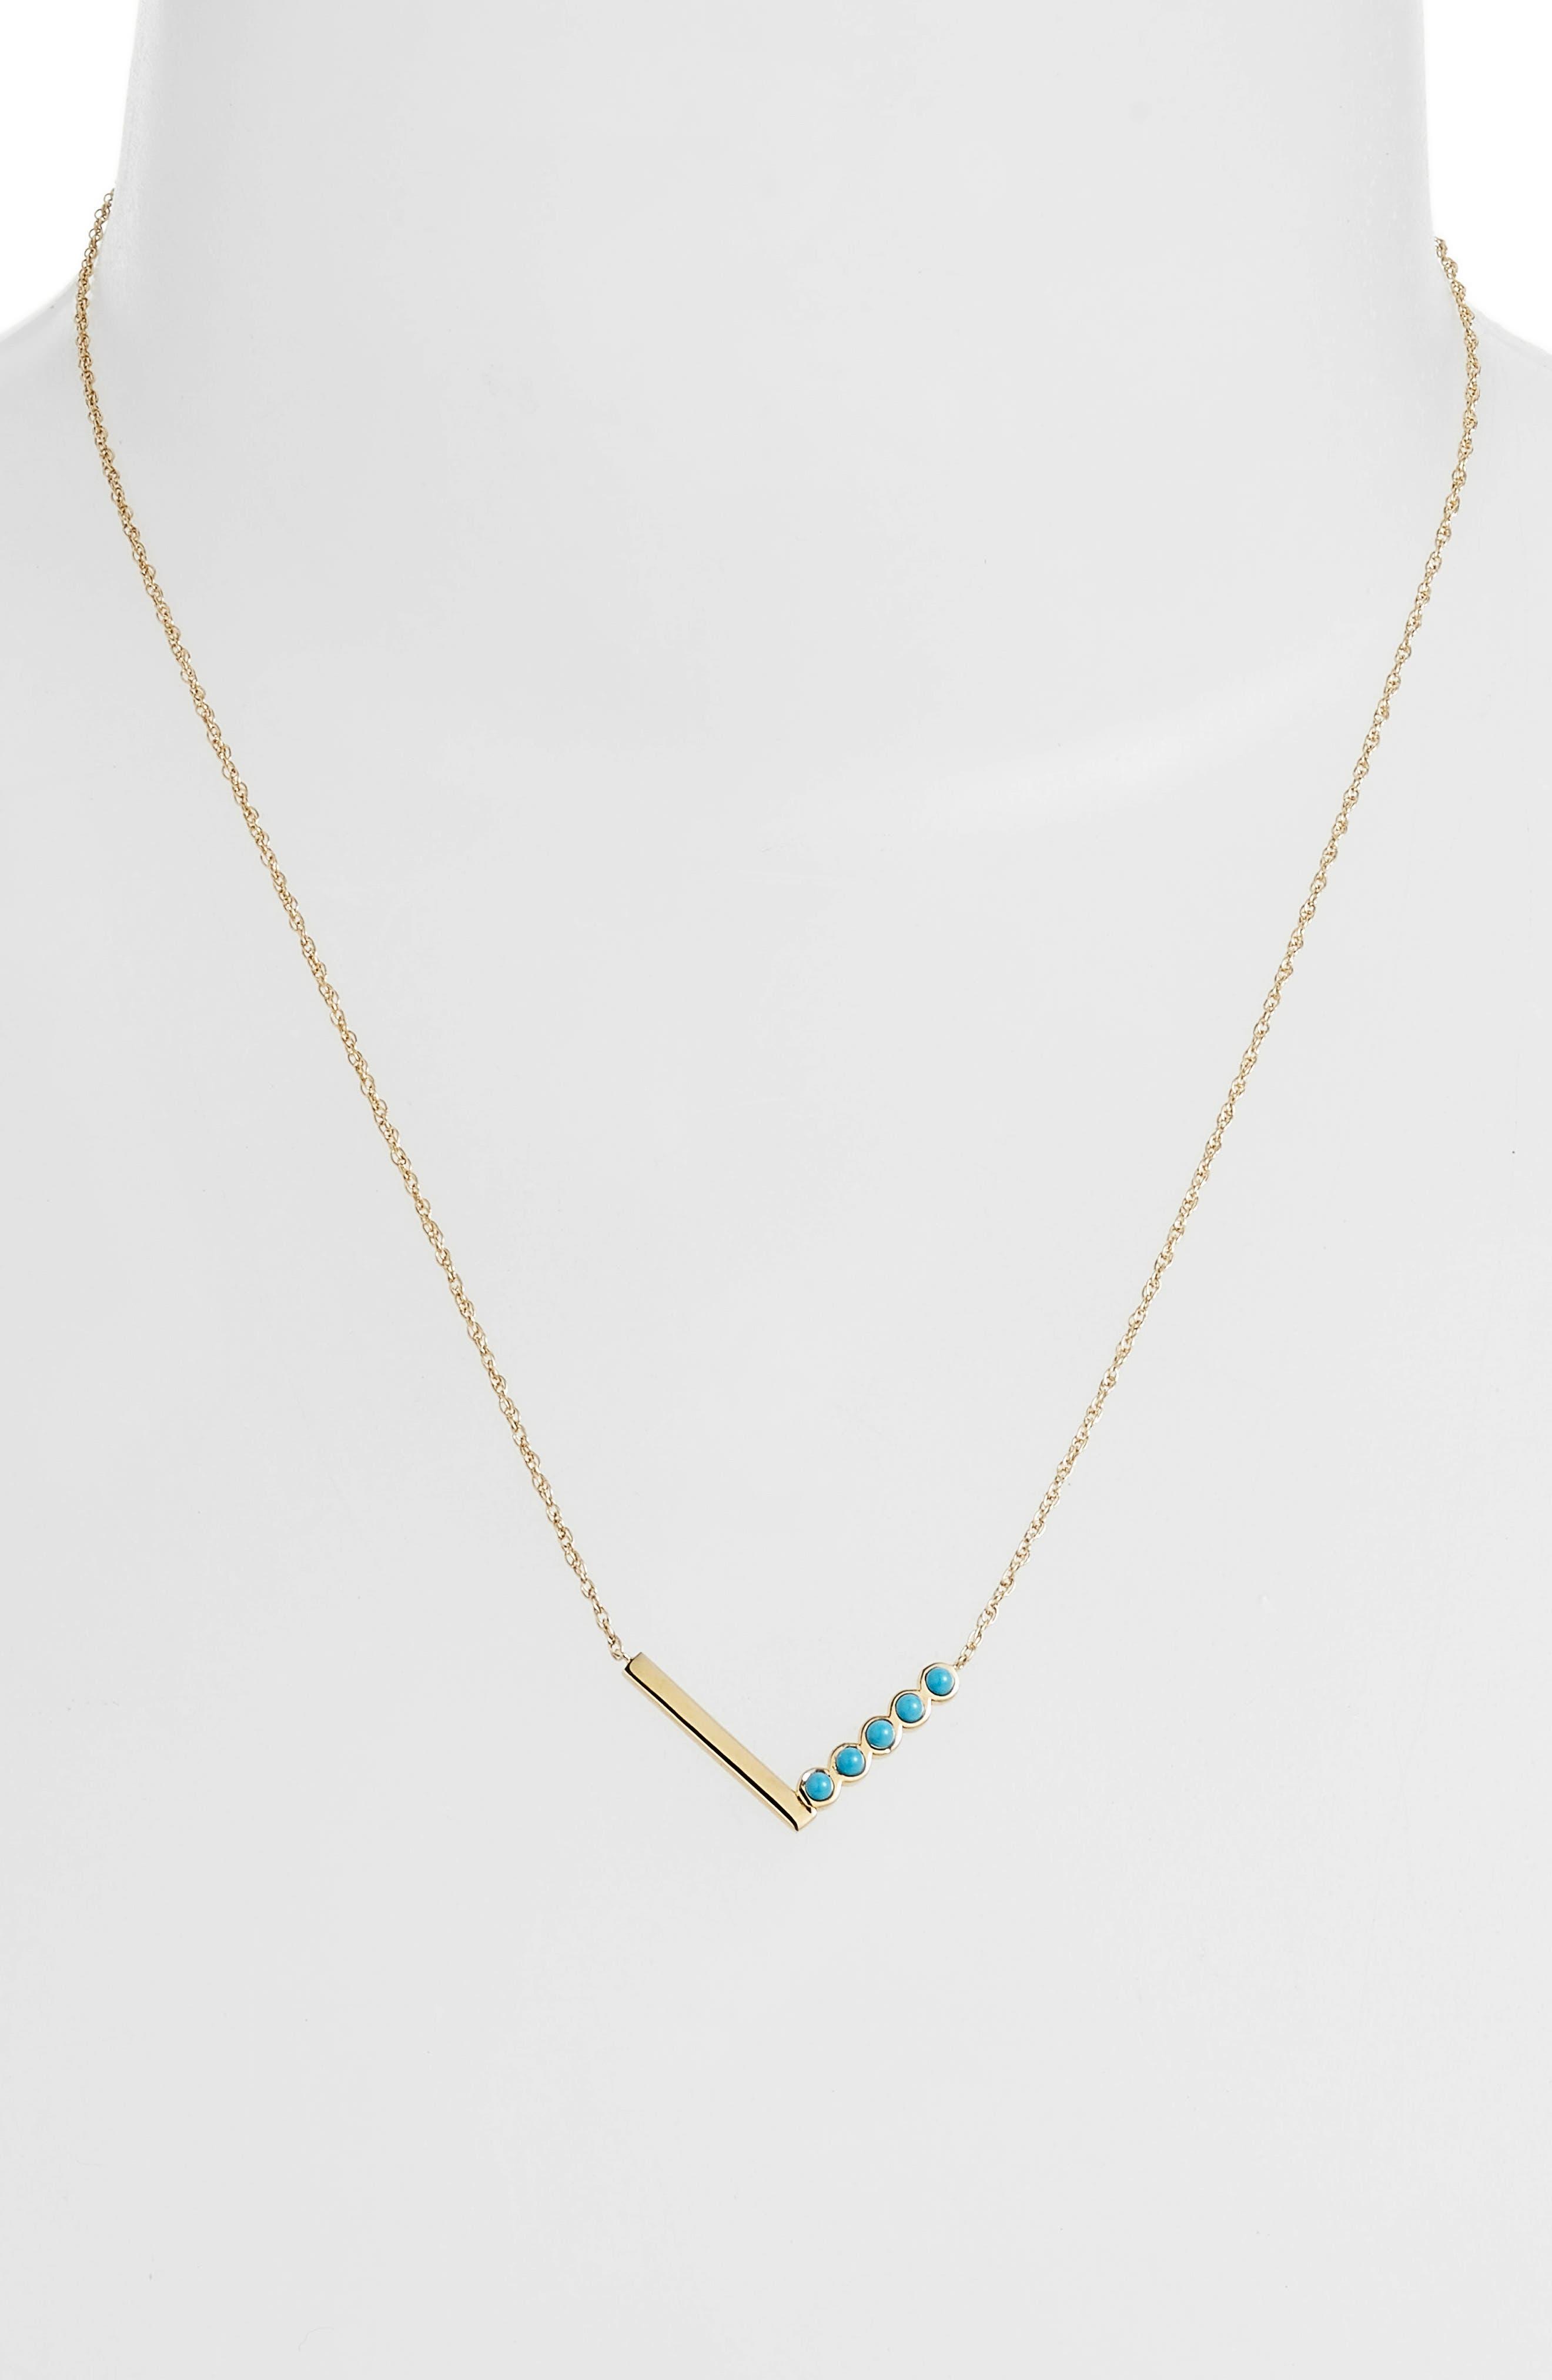 Willow Turquoise Pendant Necklace,                             Alternate thumbnail 2, color,                             Yellow Vermeil